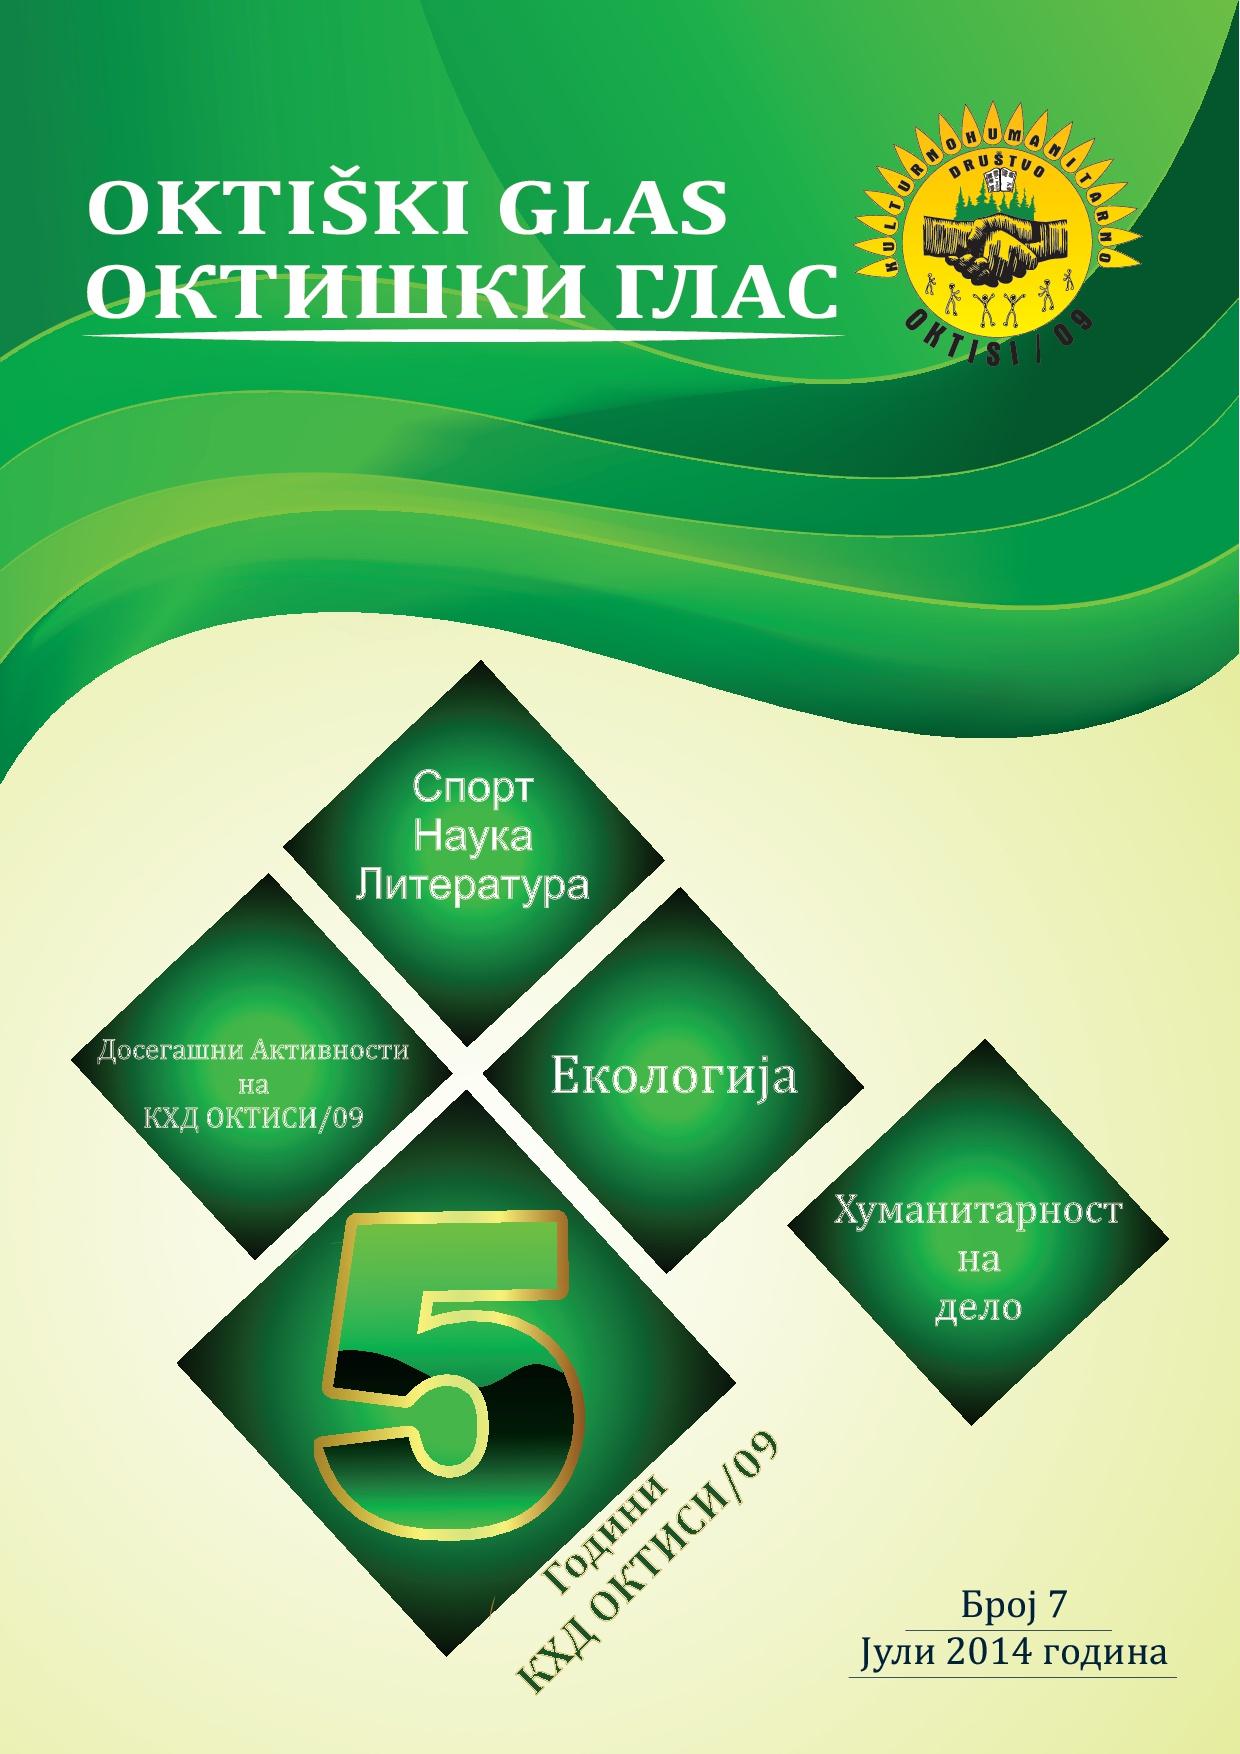 Oktiski Glas Br7 - Juli 2014